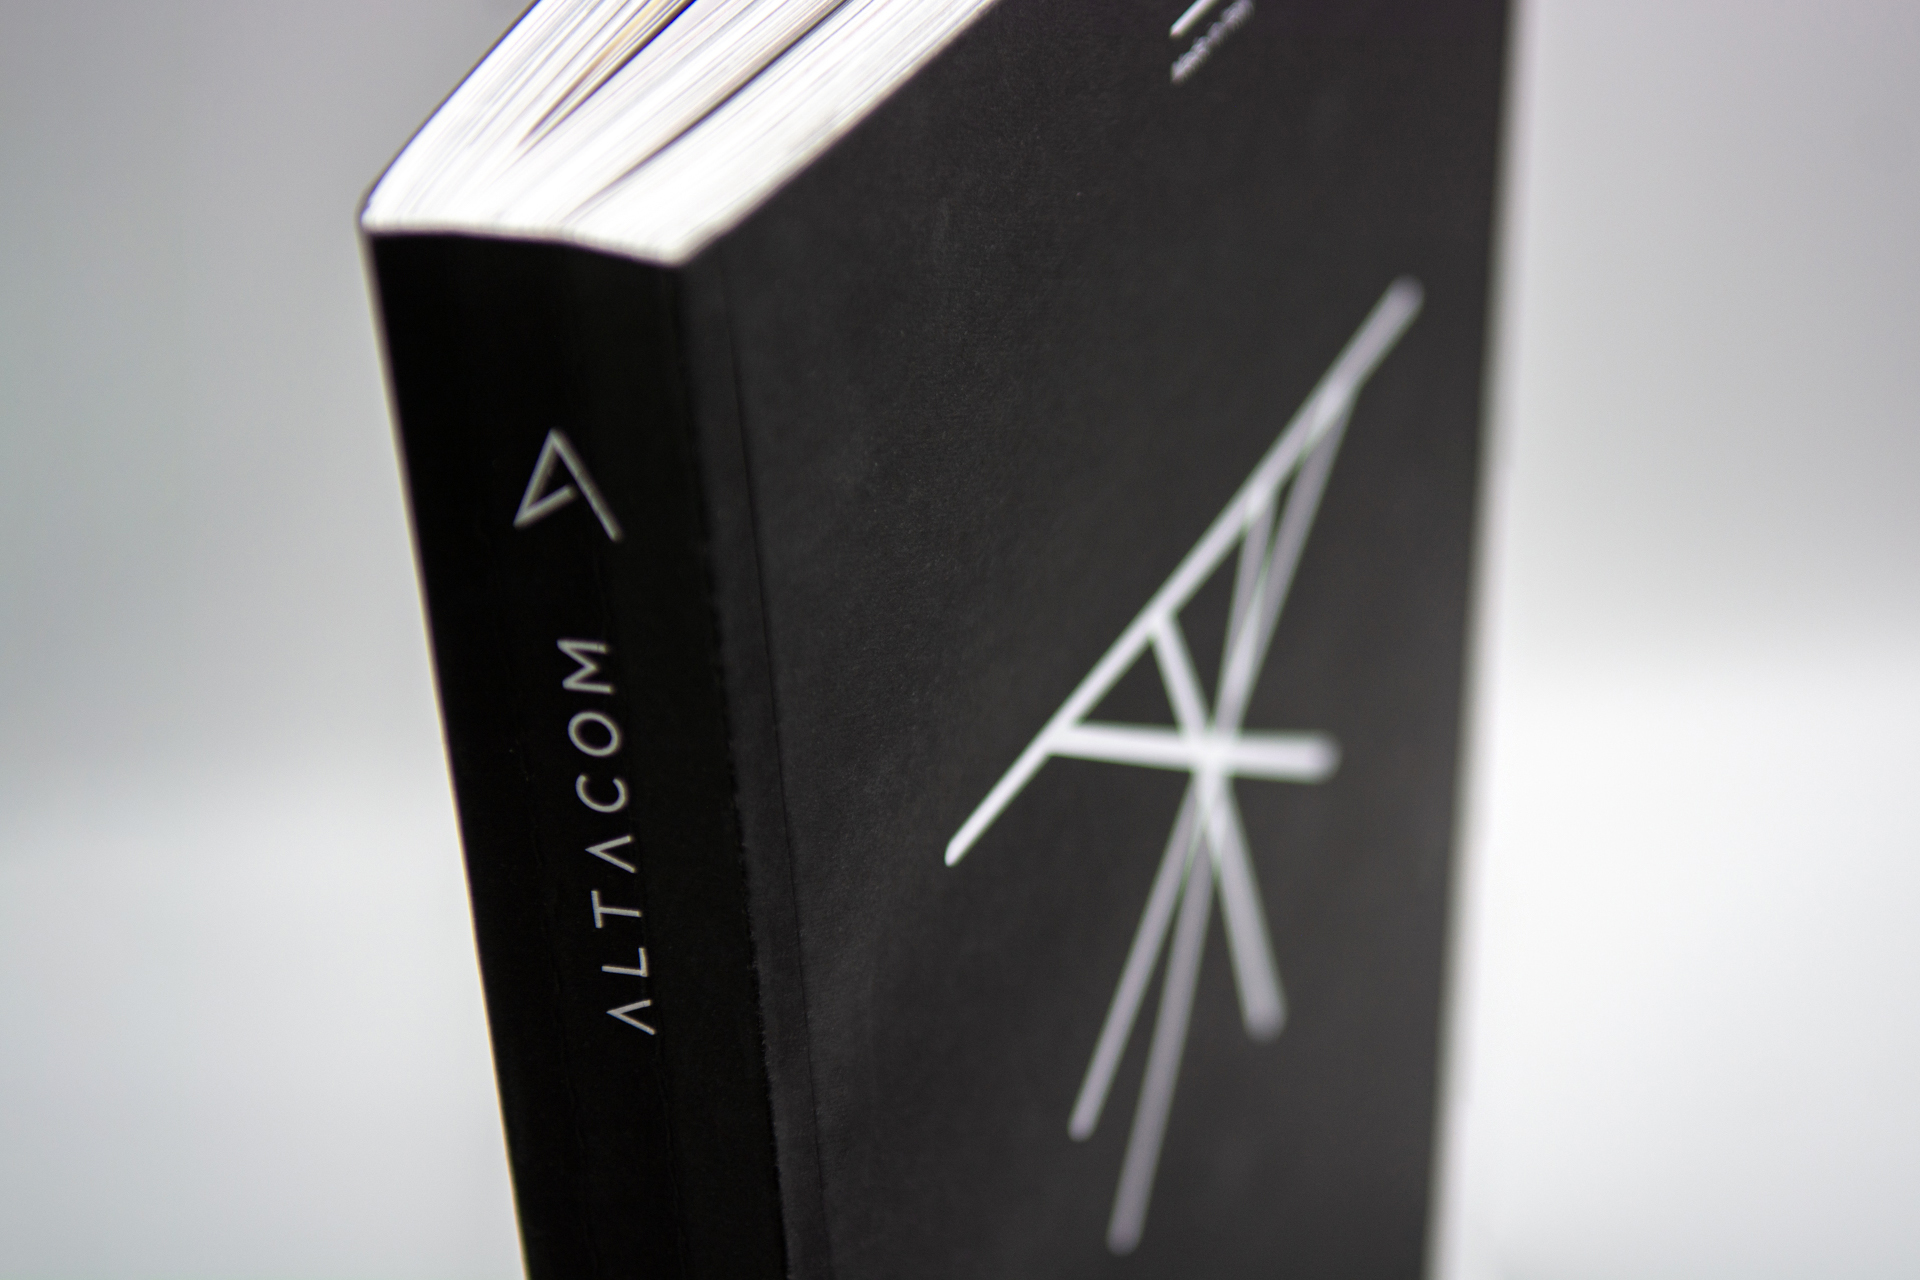 altacom-tavoli-design-cover-lato